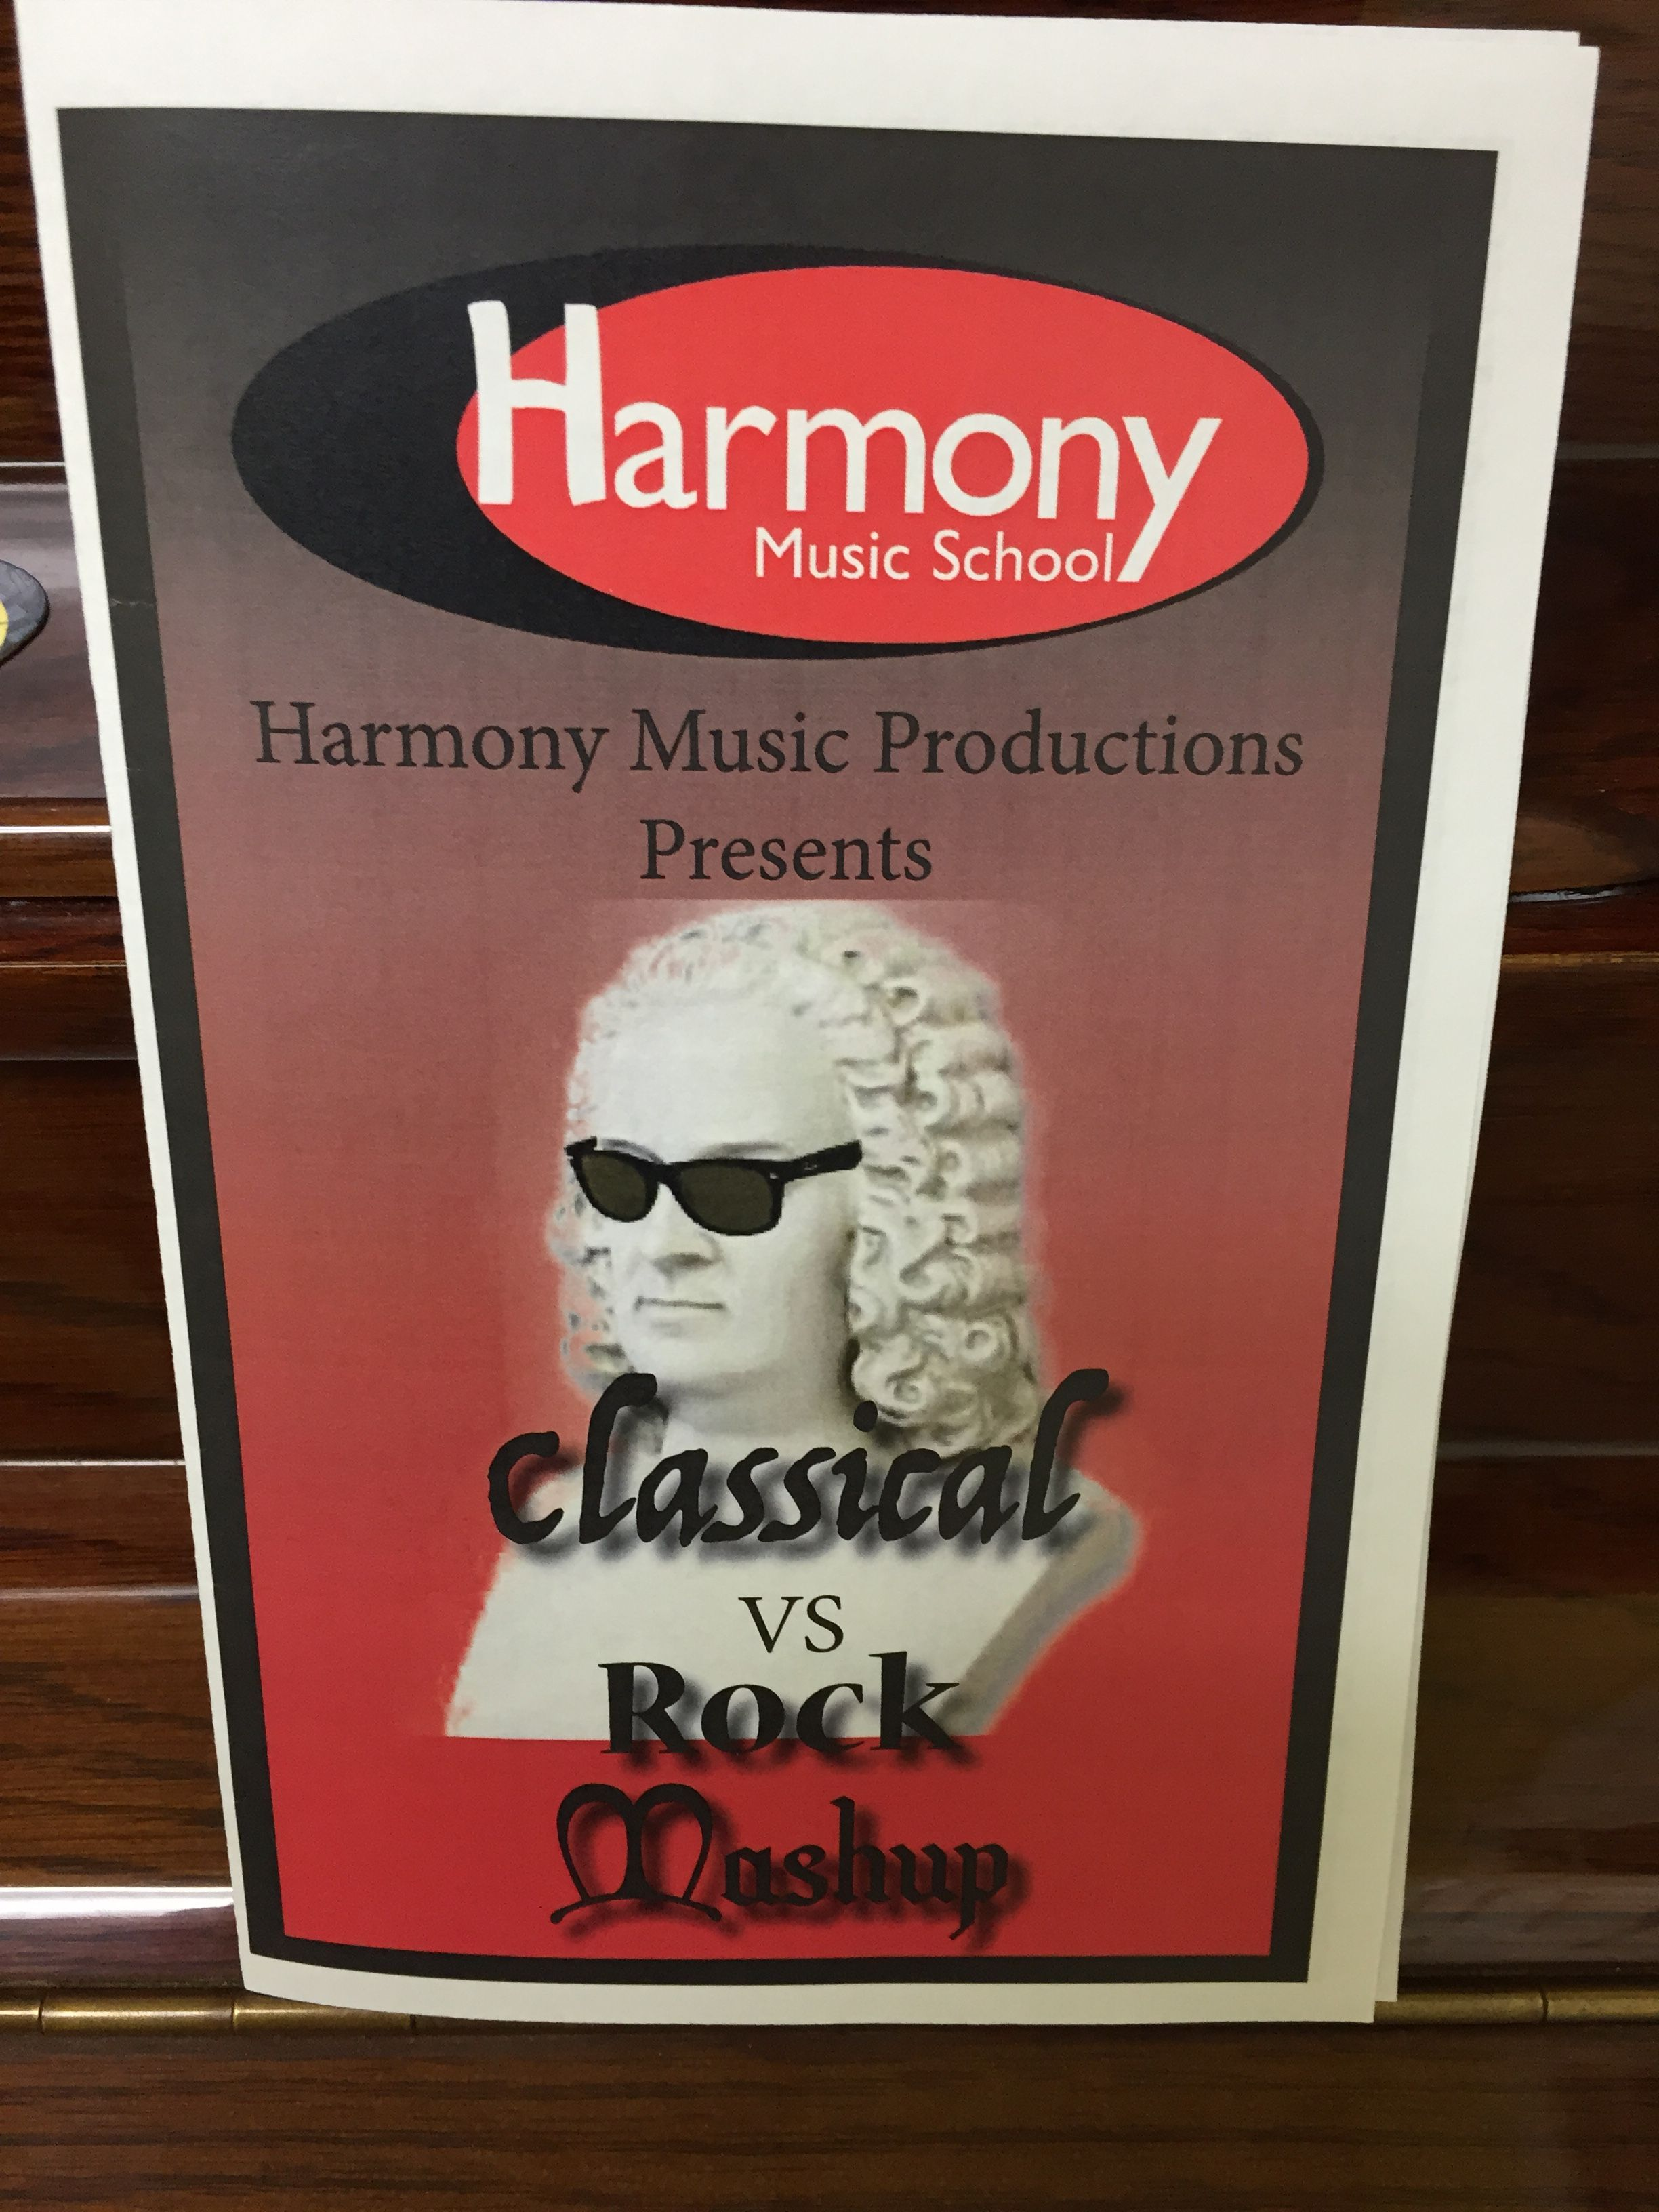 Pin By Brian On Hms In 2020 Harmony Music Music School School